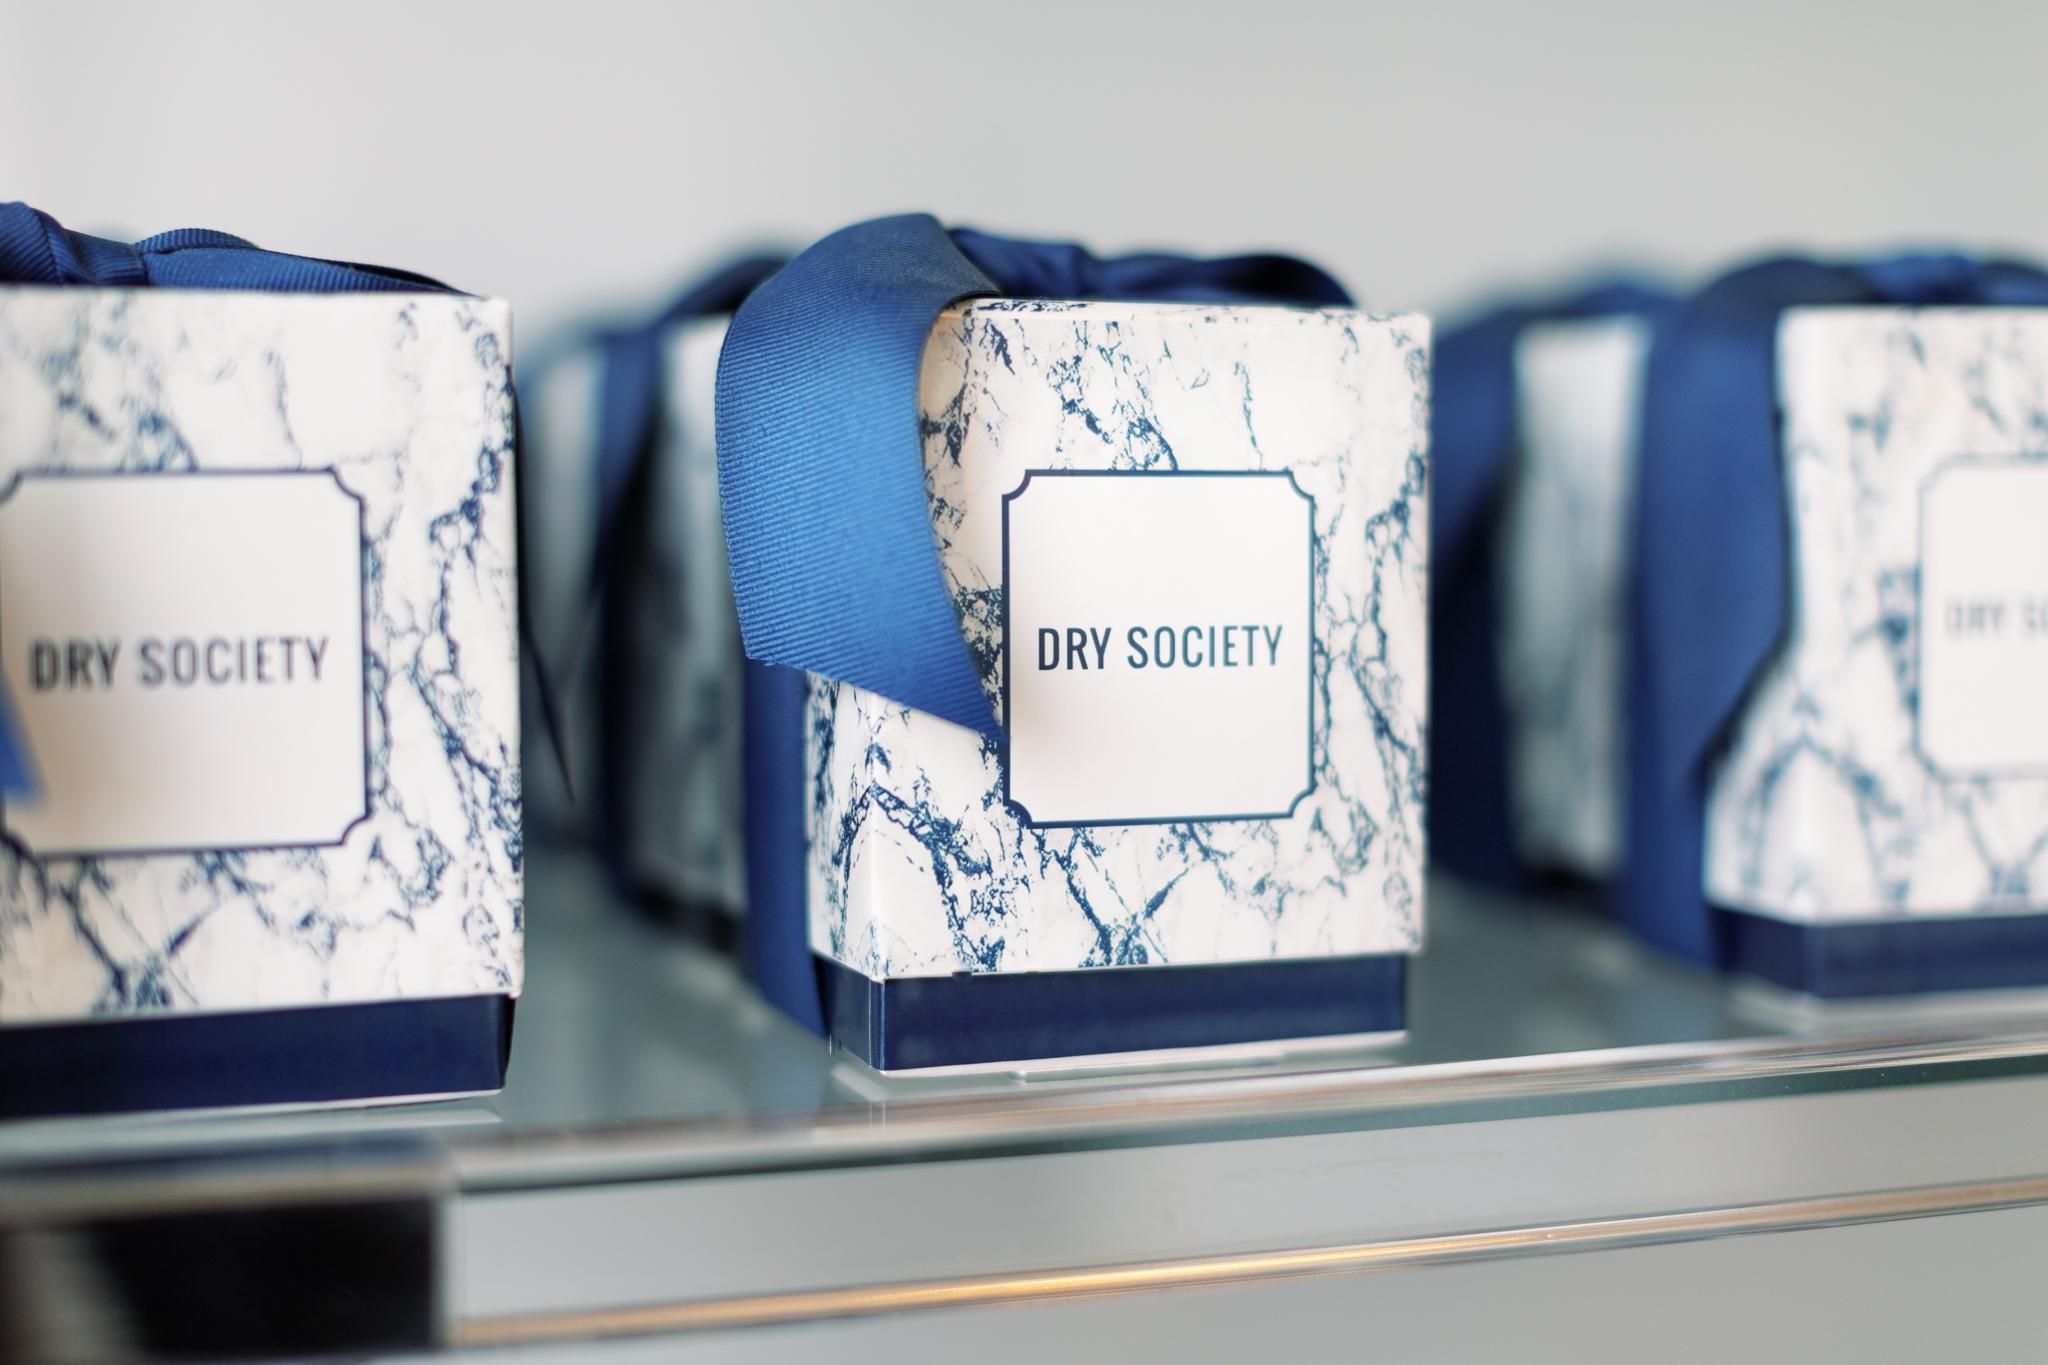 dry society-122.jpg